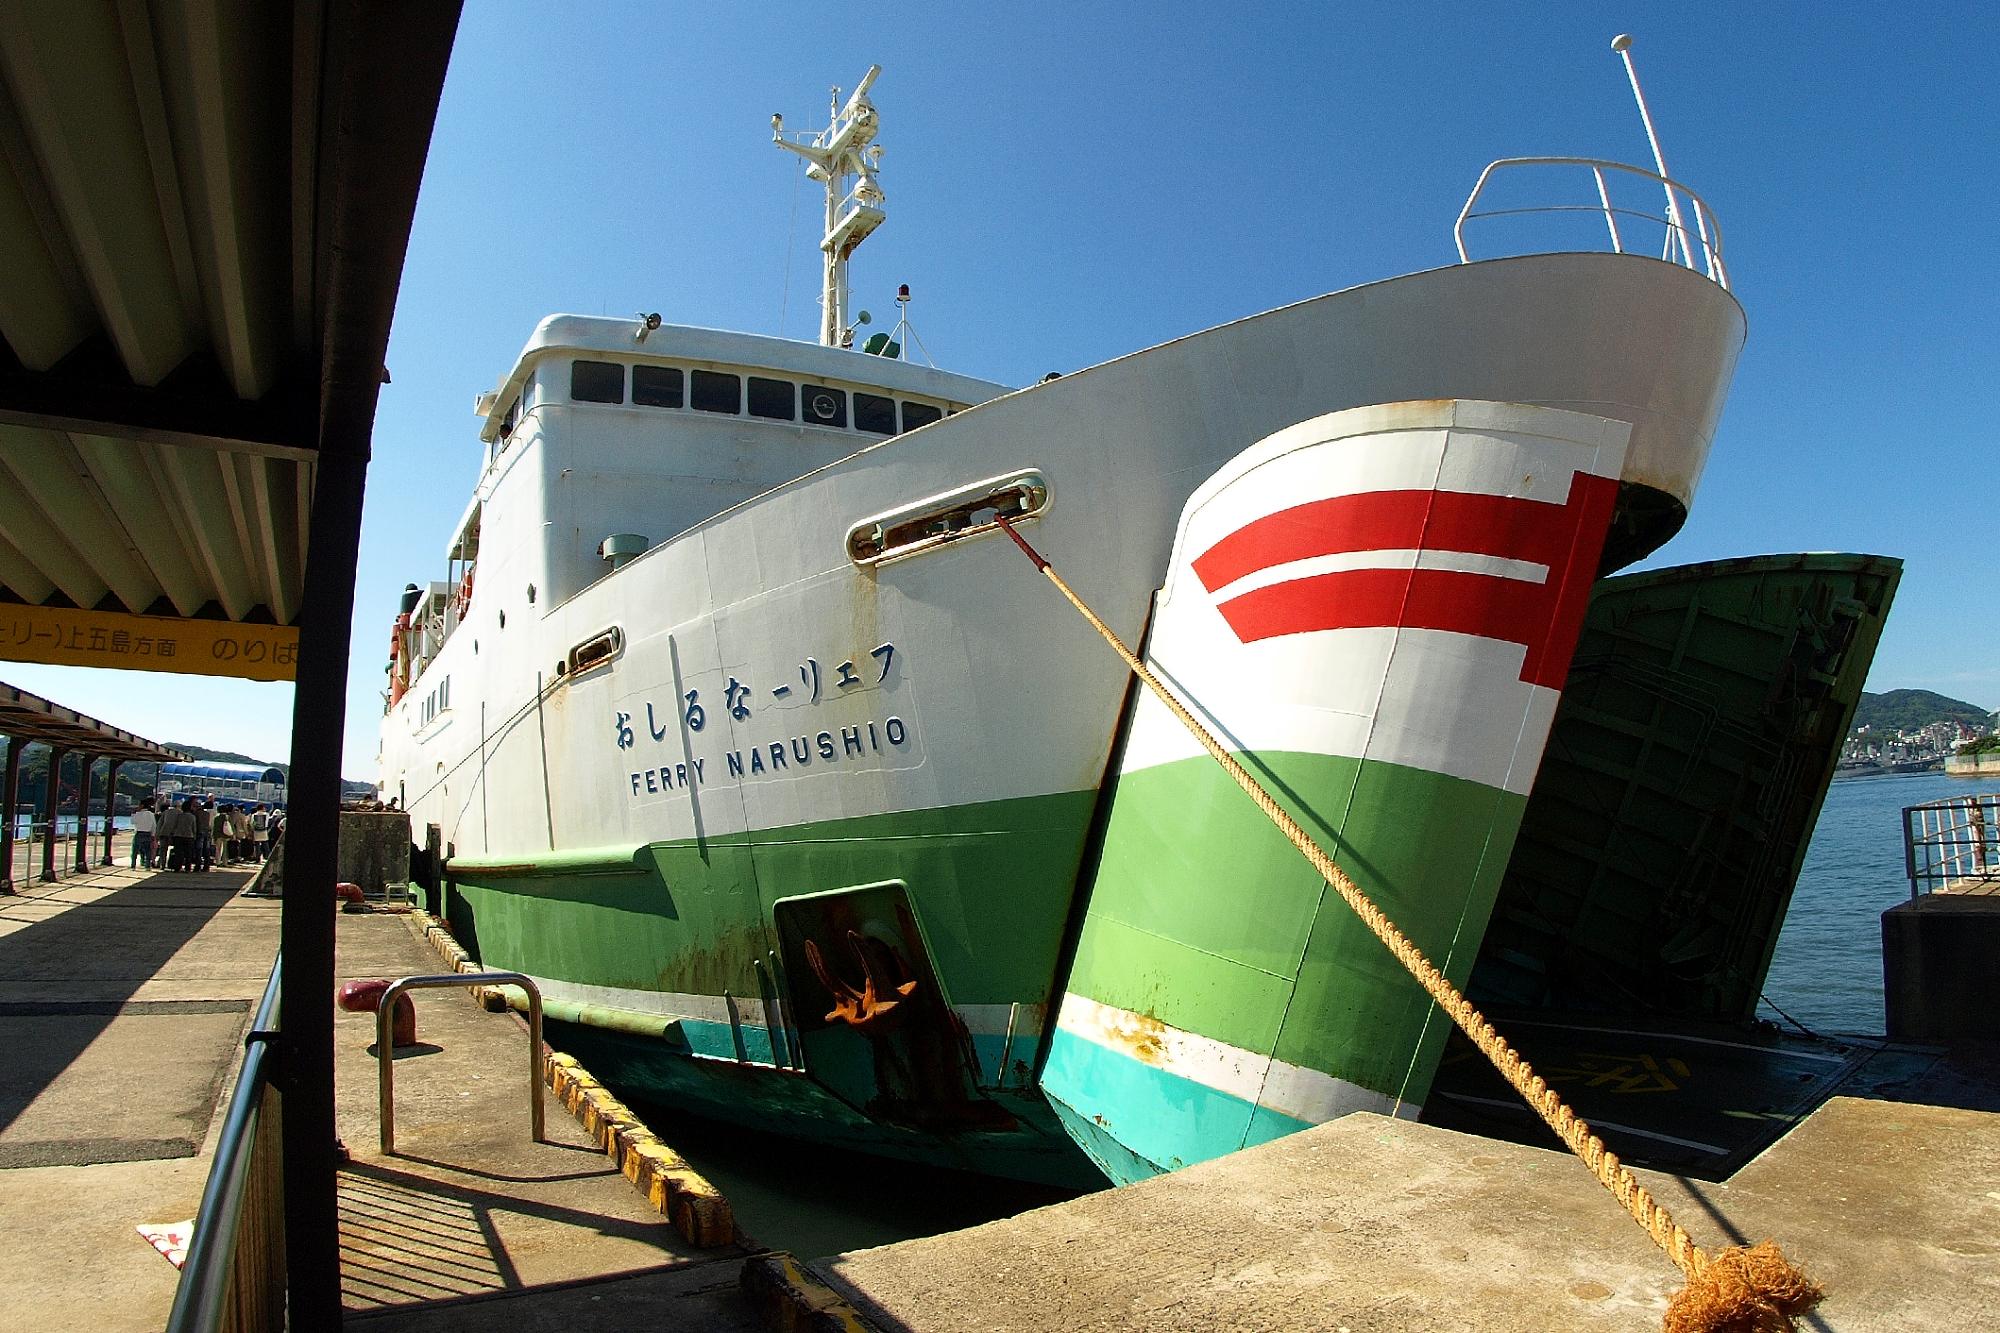 九州 商船 本日 の 運行 状況